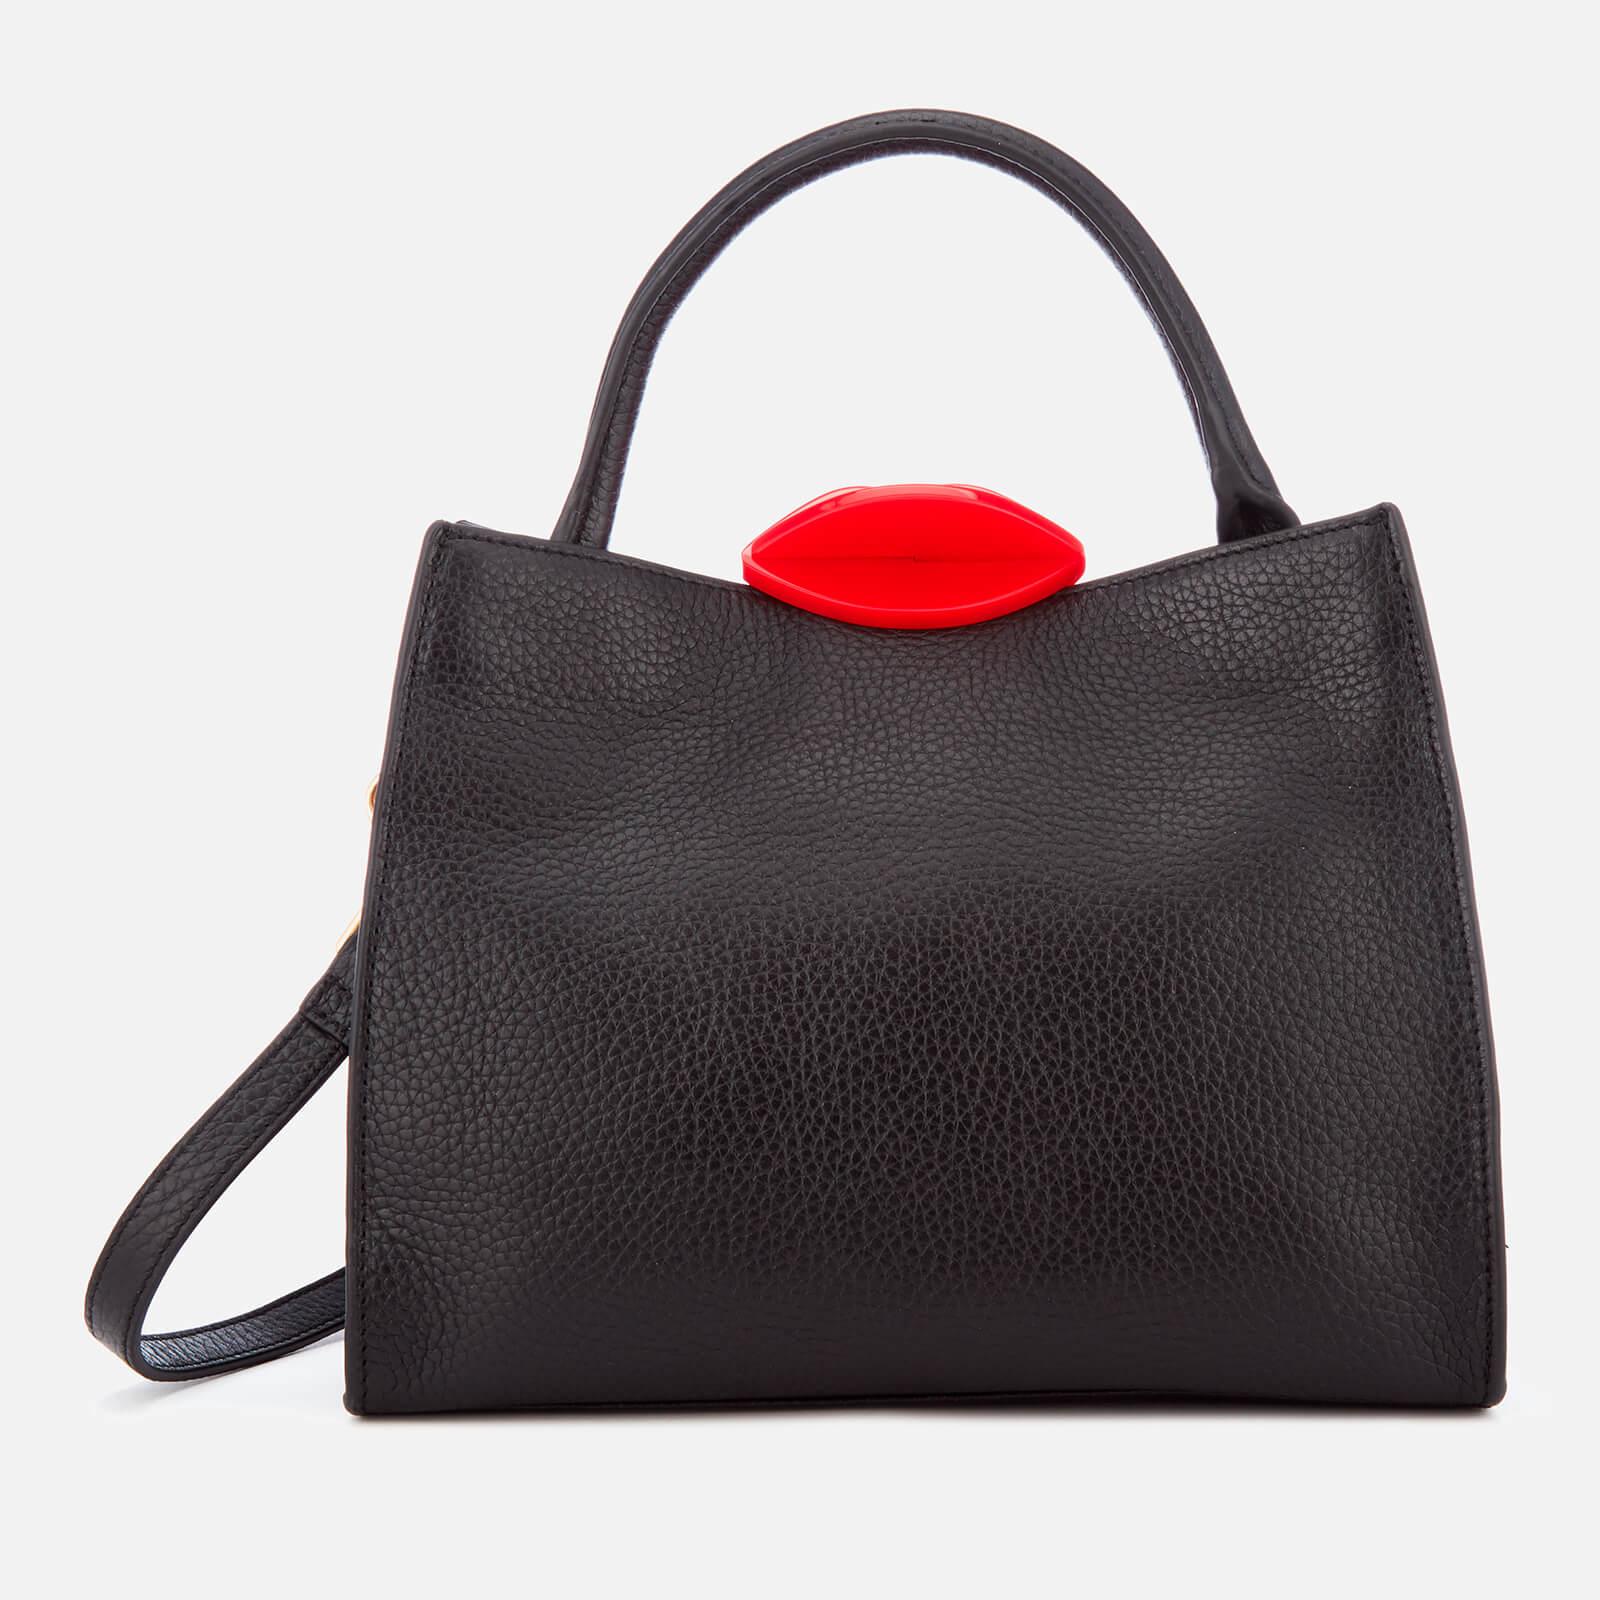 55aeae2bed5 ... Lulu Guinness Women s Small Locked Lips Opt Strap Annette Tote Bag -  Black